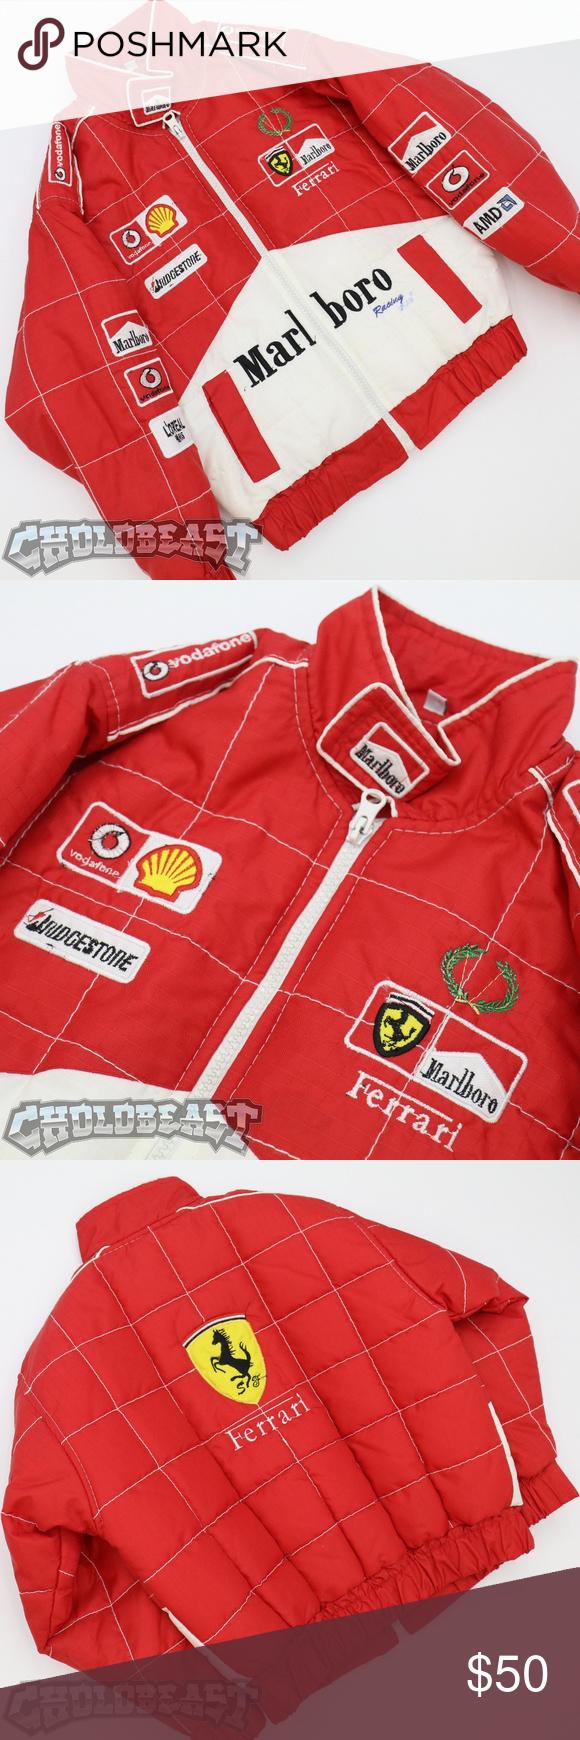 Vintage 90s Marlboro Racing Ferrari Loreal Shell 4 Vintage Jacket Clothes Design Kids Jacket